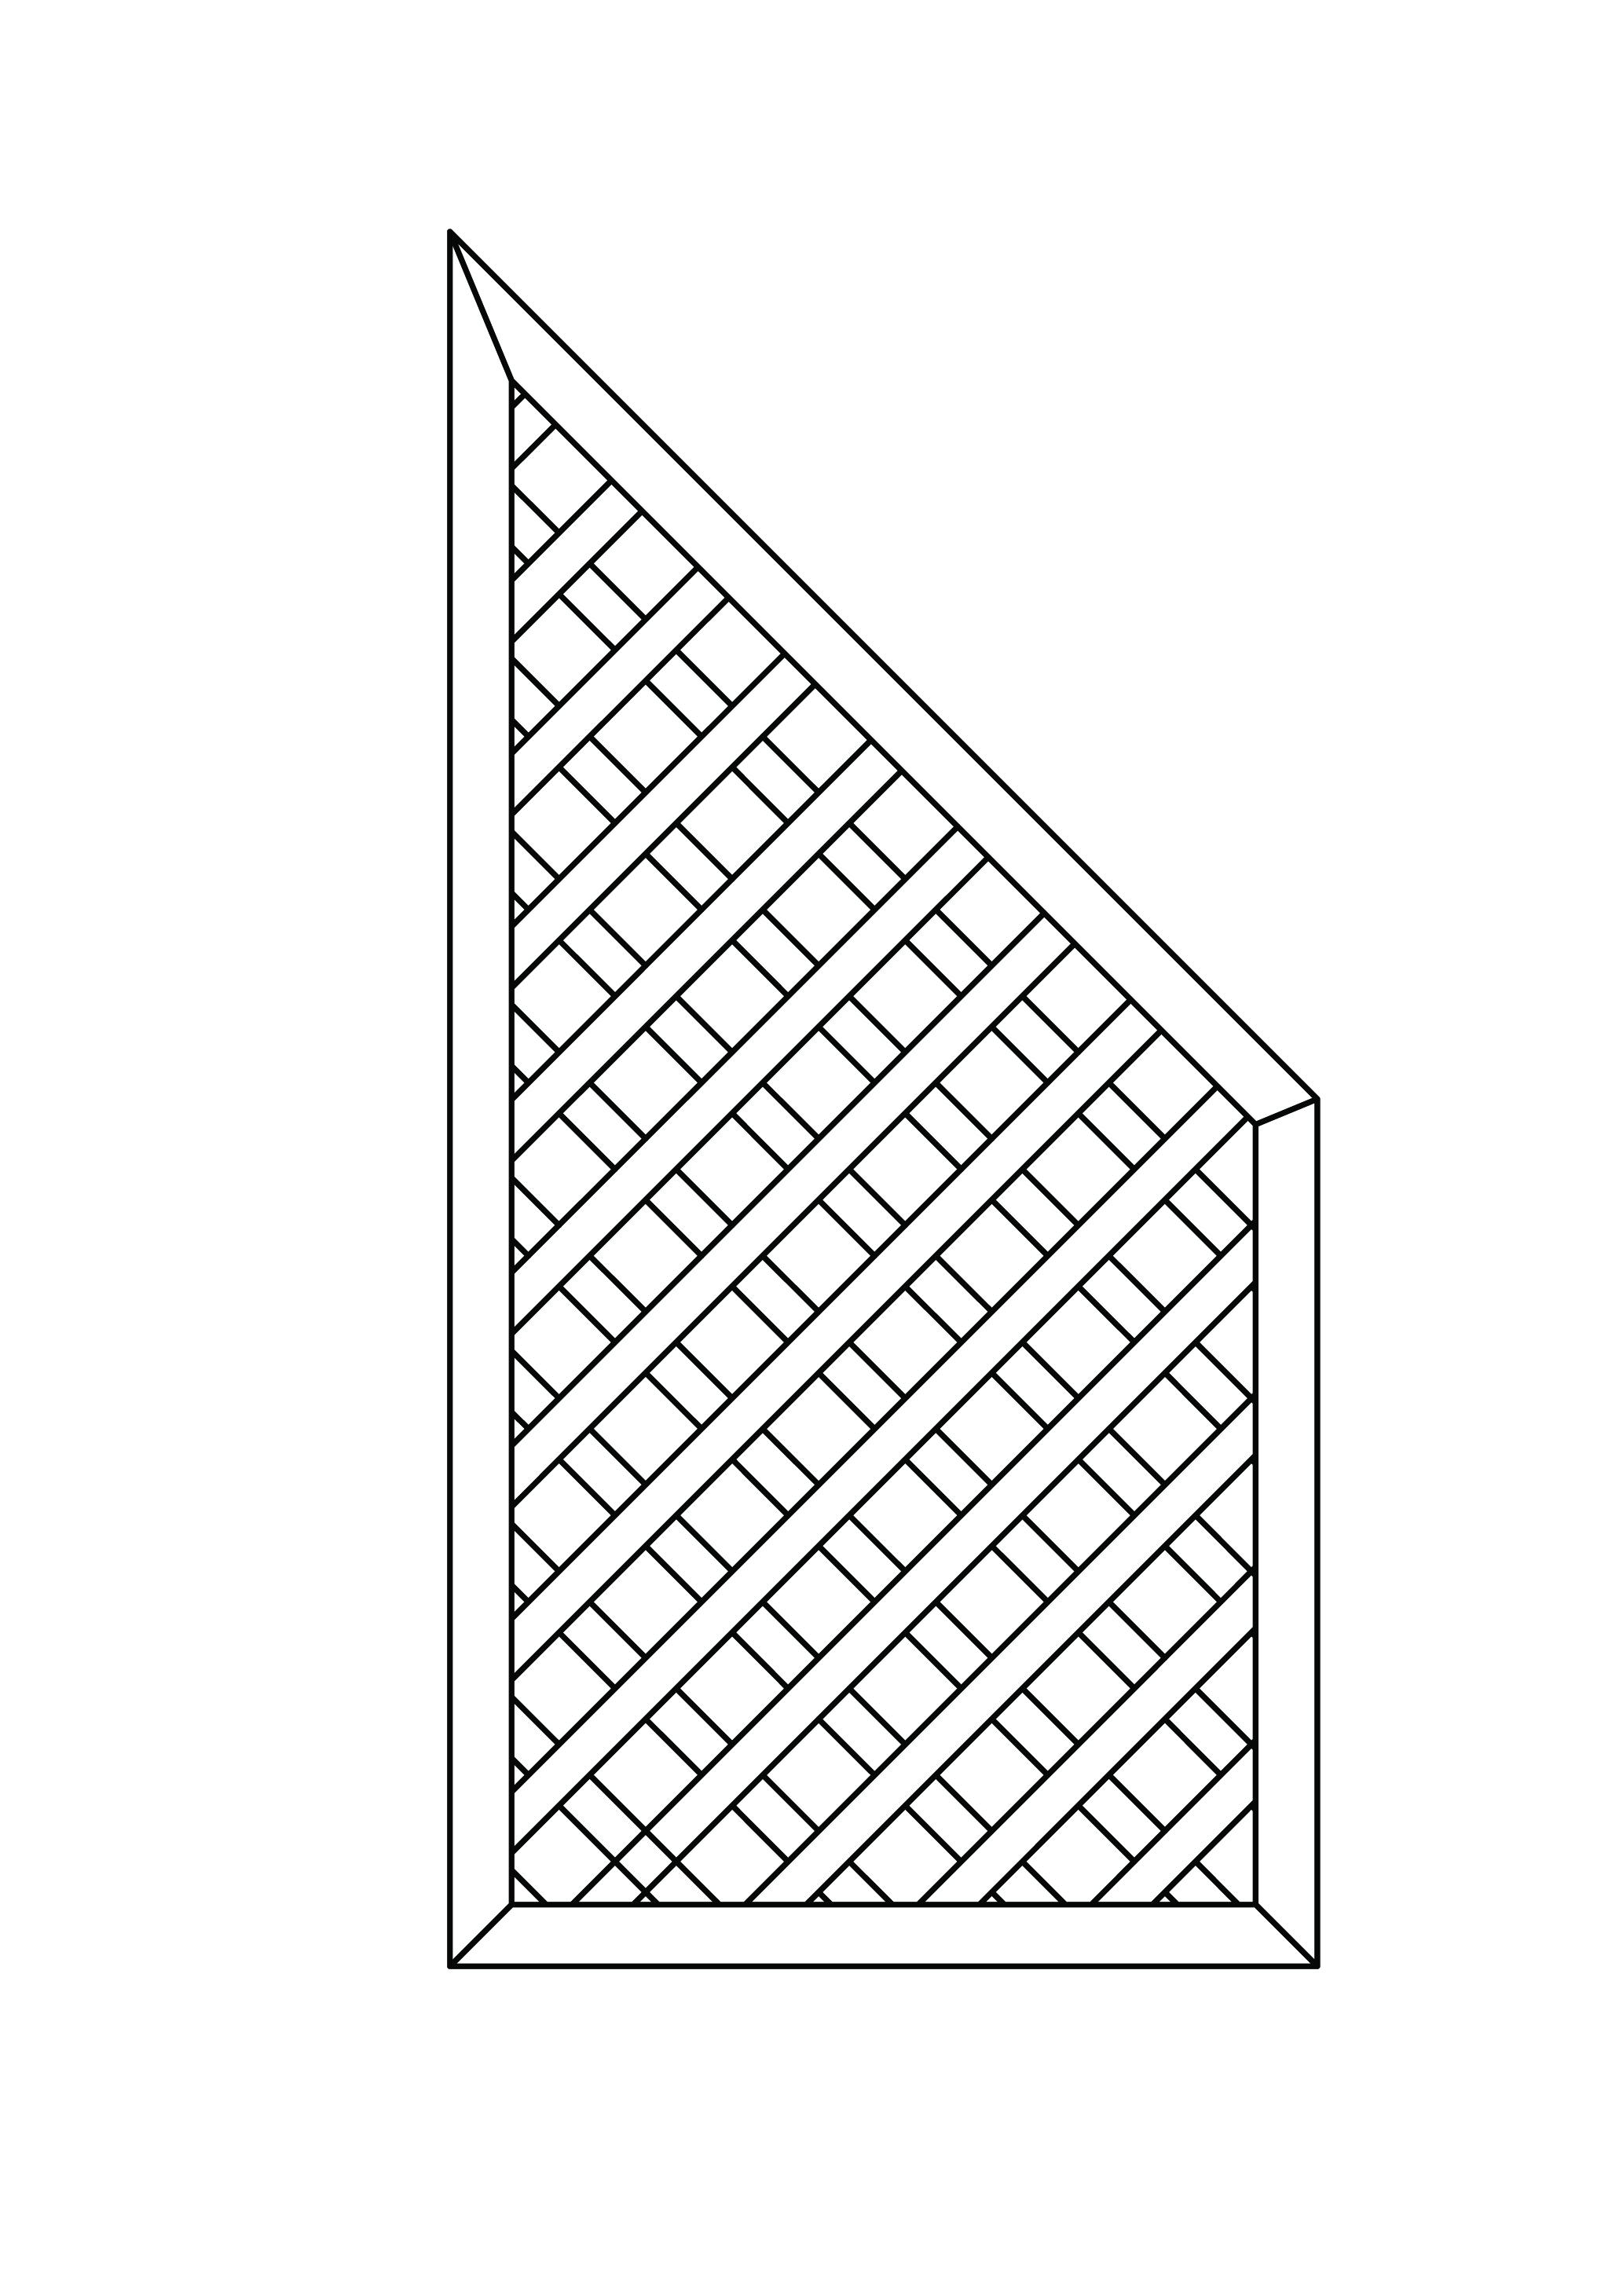 neueste zaunlatten kunststoff wei design ideen terrasse. Black Bedroom Furniture Sets. Home Design Ideas